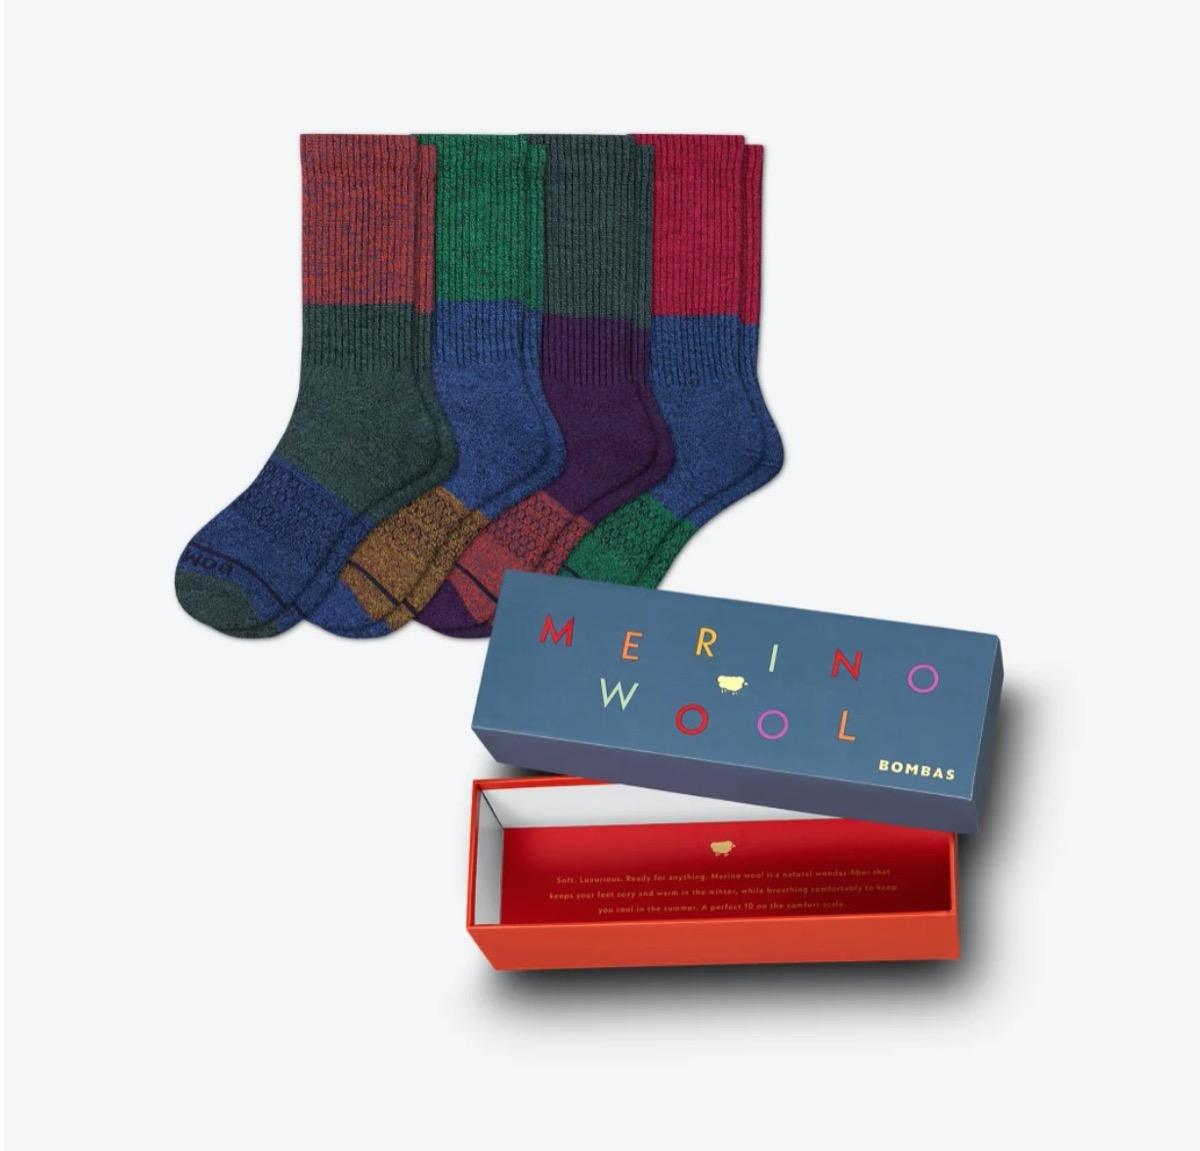 color blocked wool socks and box